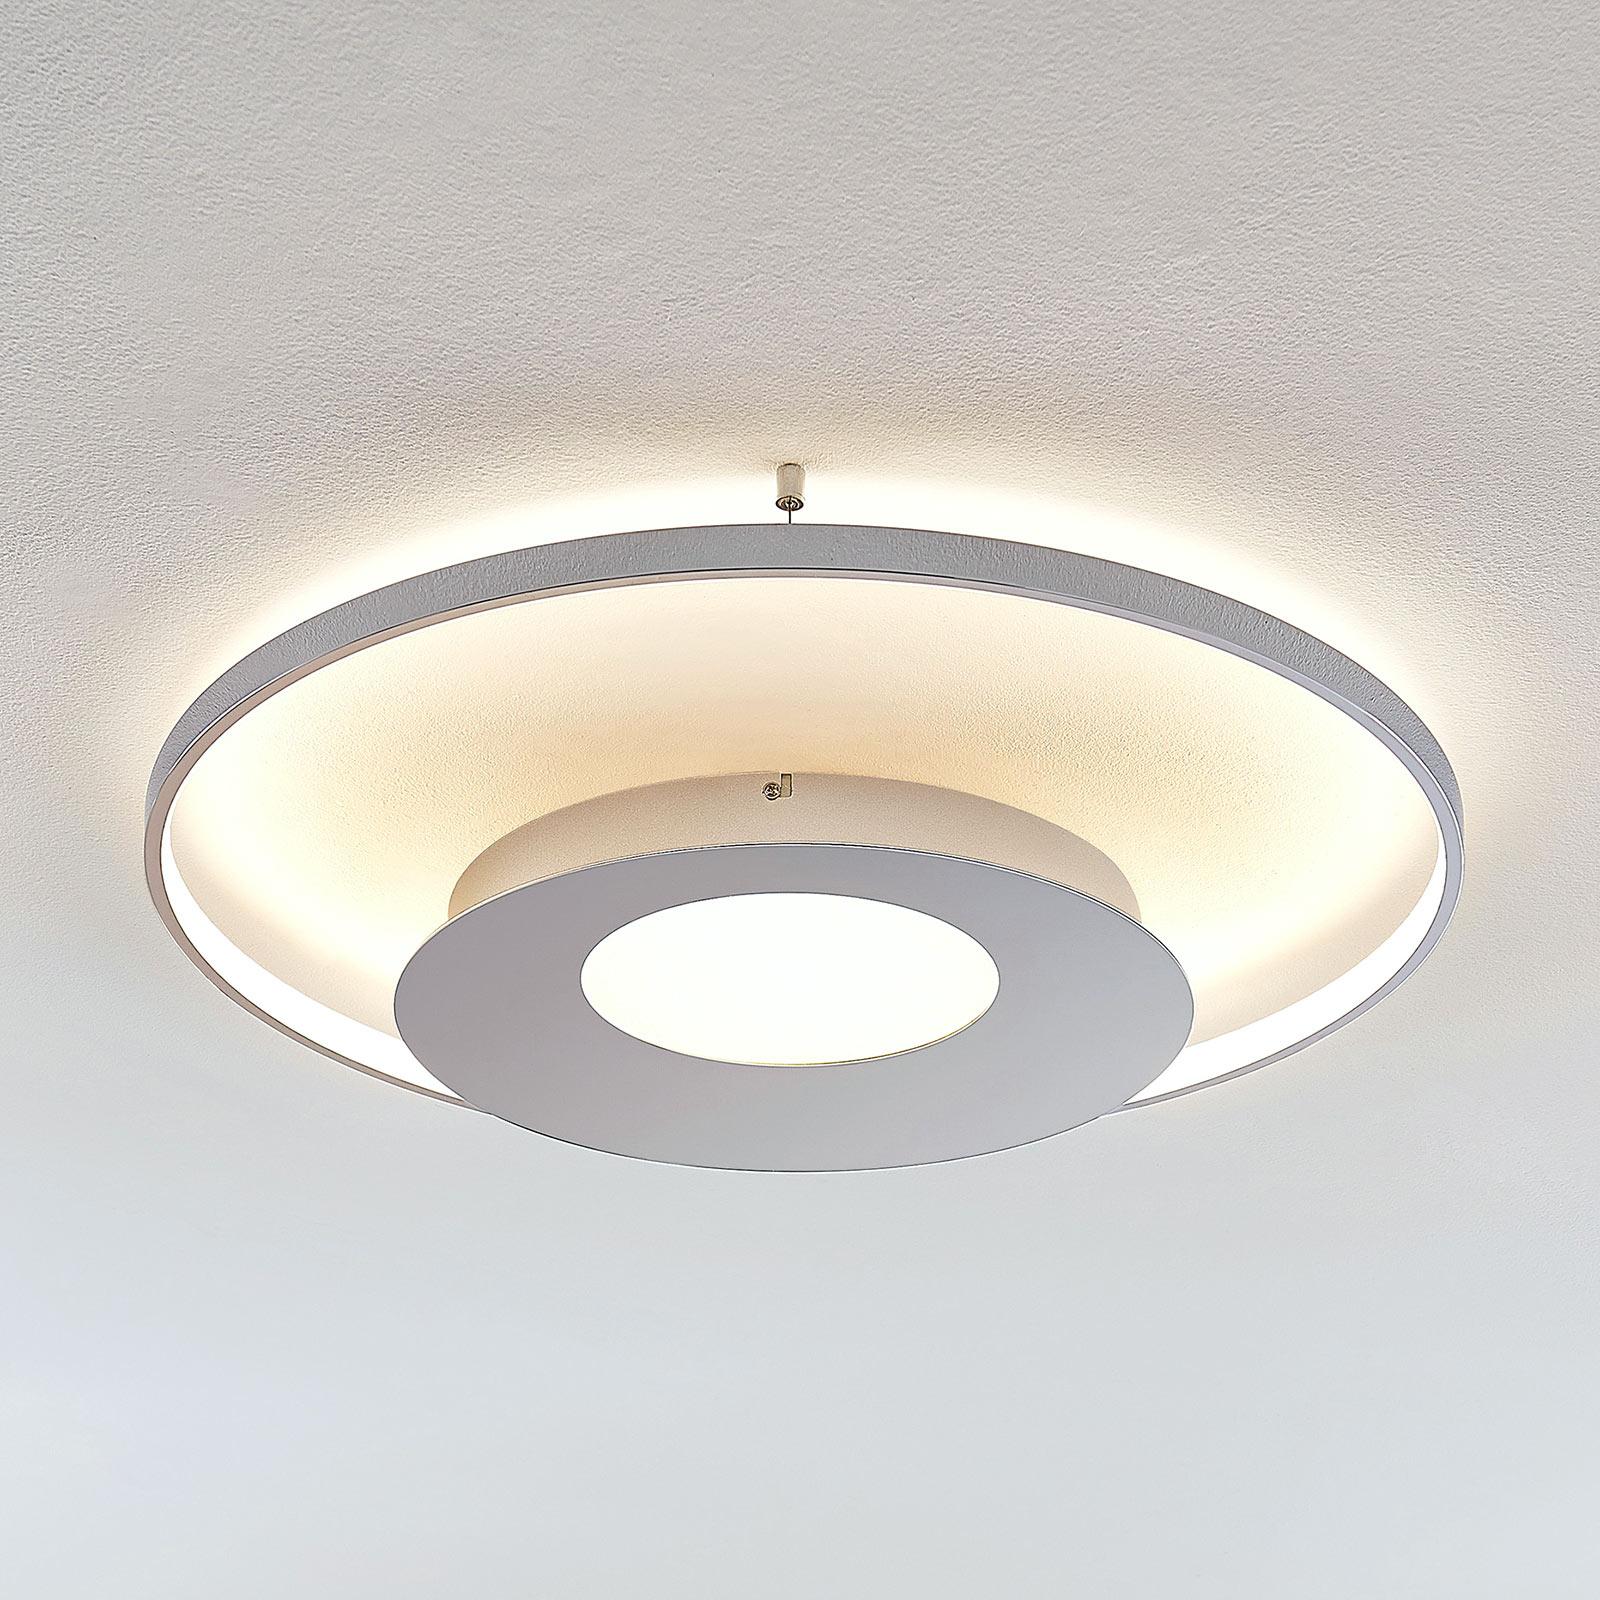 Plafonnier LED Anays, rond, 62 cm